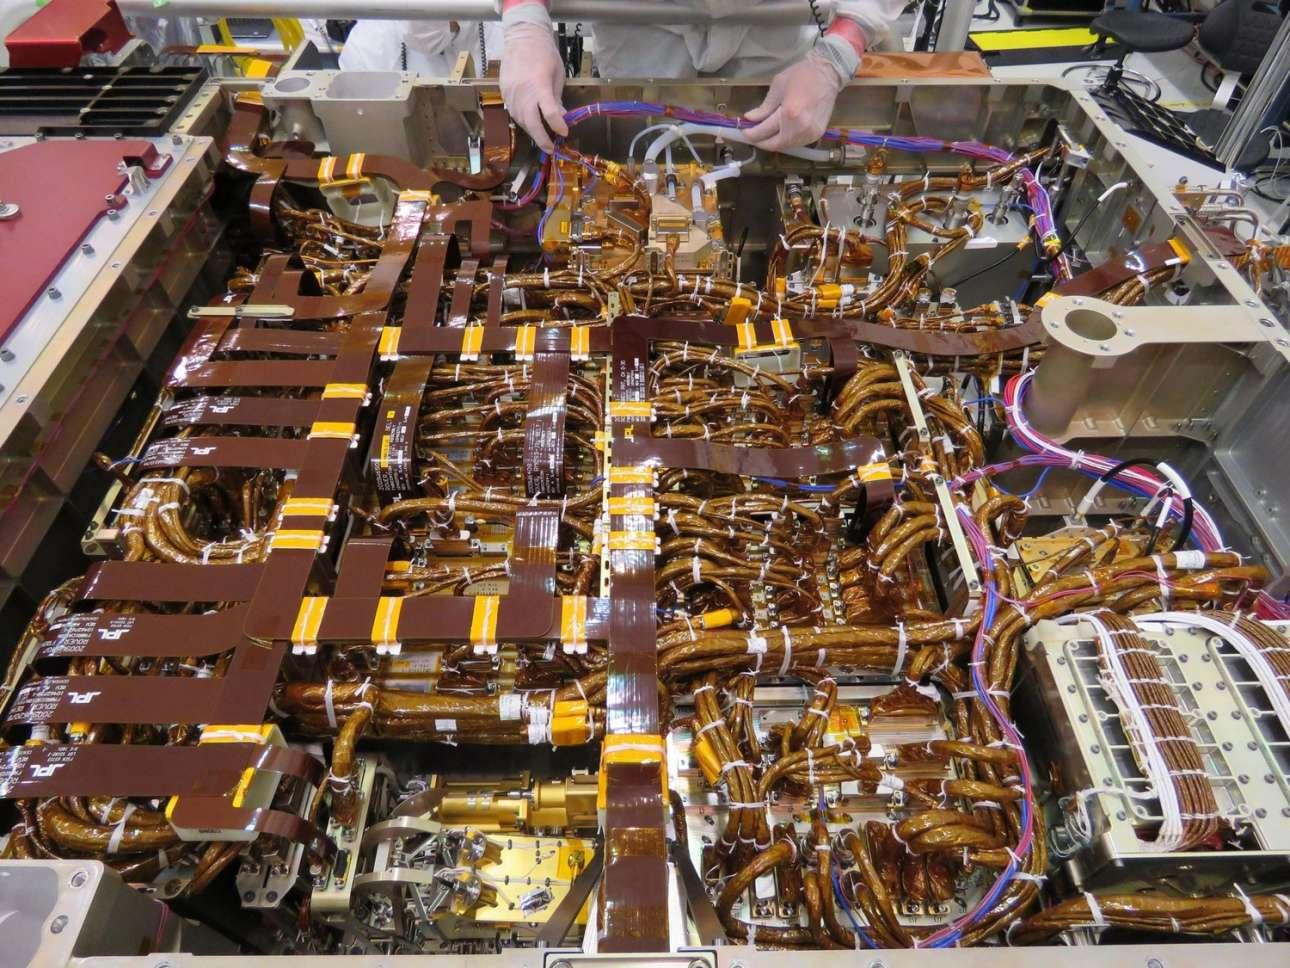 Tα όργανα και τα εργαστήρια. Στις εγκαταστάσεις του Εργαστηρίου Αεριώθησης της NASA έγινε η τοποθέτηση στο ρόβερ διαφόρων οργάνων και εργαστηρίων, όπως οι κάμερες και το Mars Oxygen In-Situ Resource Utilization Experiment, ένα σύστημα εξαγωγής οξυγόνου από το διοξείδιο του άνθρακα που αφθονεί στην αρειανή ατμόσφαιρα. Η δυνατότητα παραγωγής οξυγόνου θα είναι απαραίτητη για την παρουσία του ανθρώπου στον Αρη